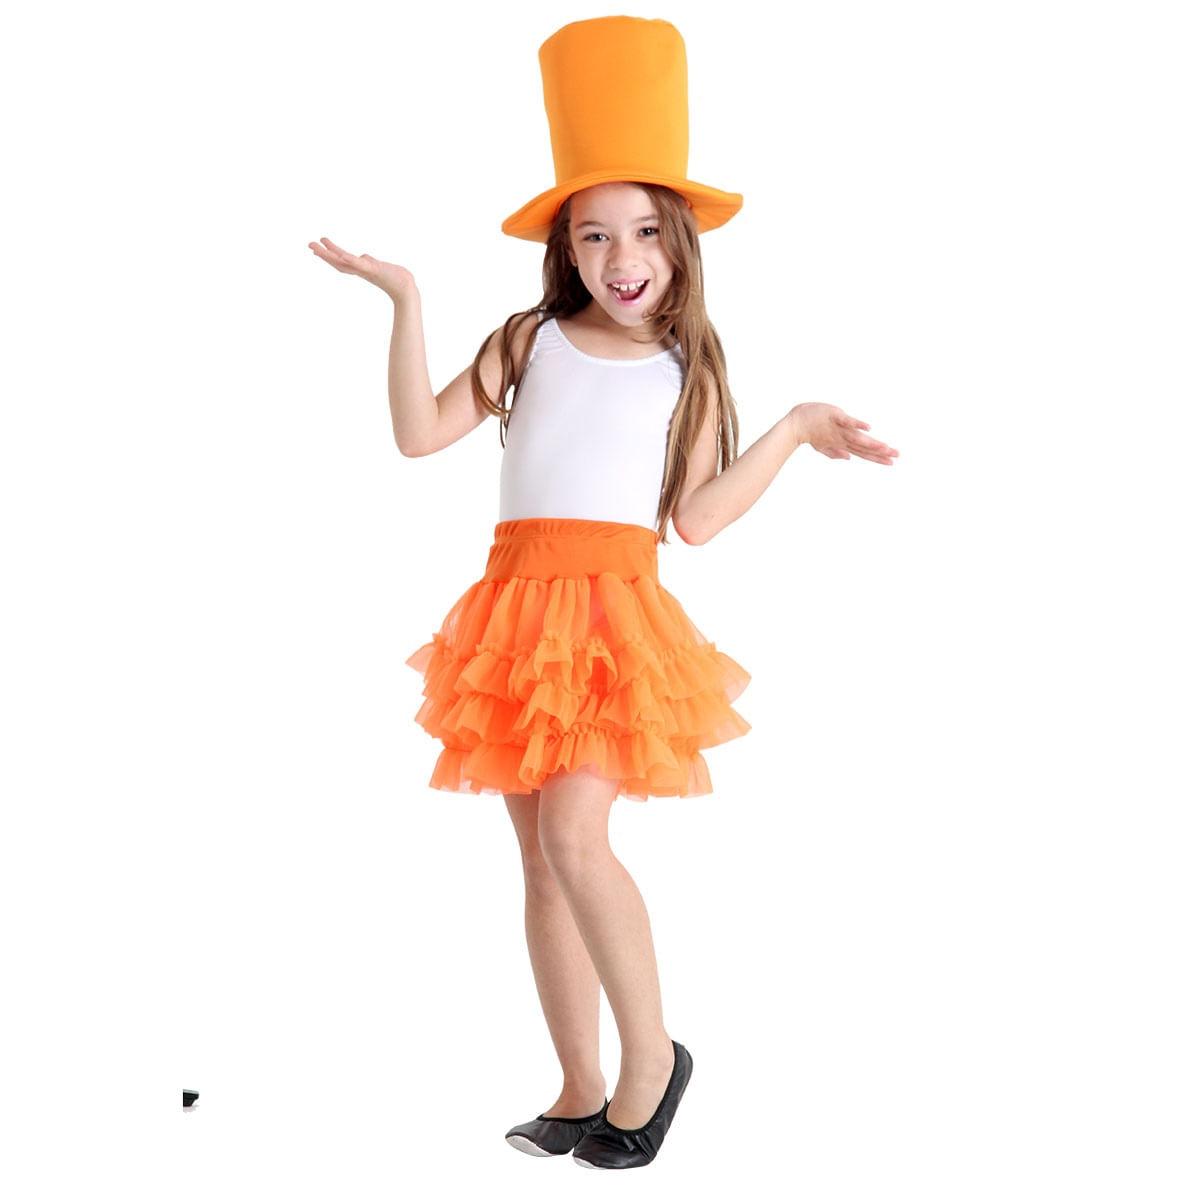 Fantasia Make Your Own - Saia Tutu Laranja Infantil P